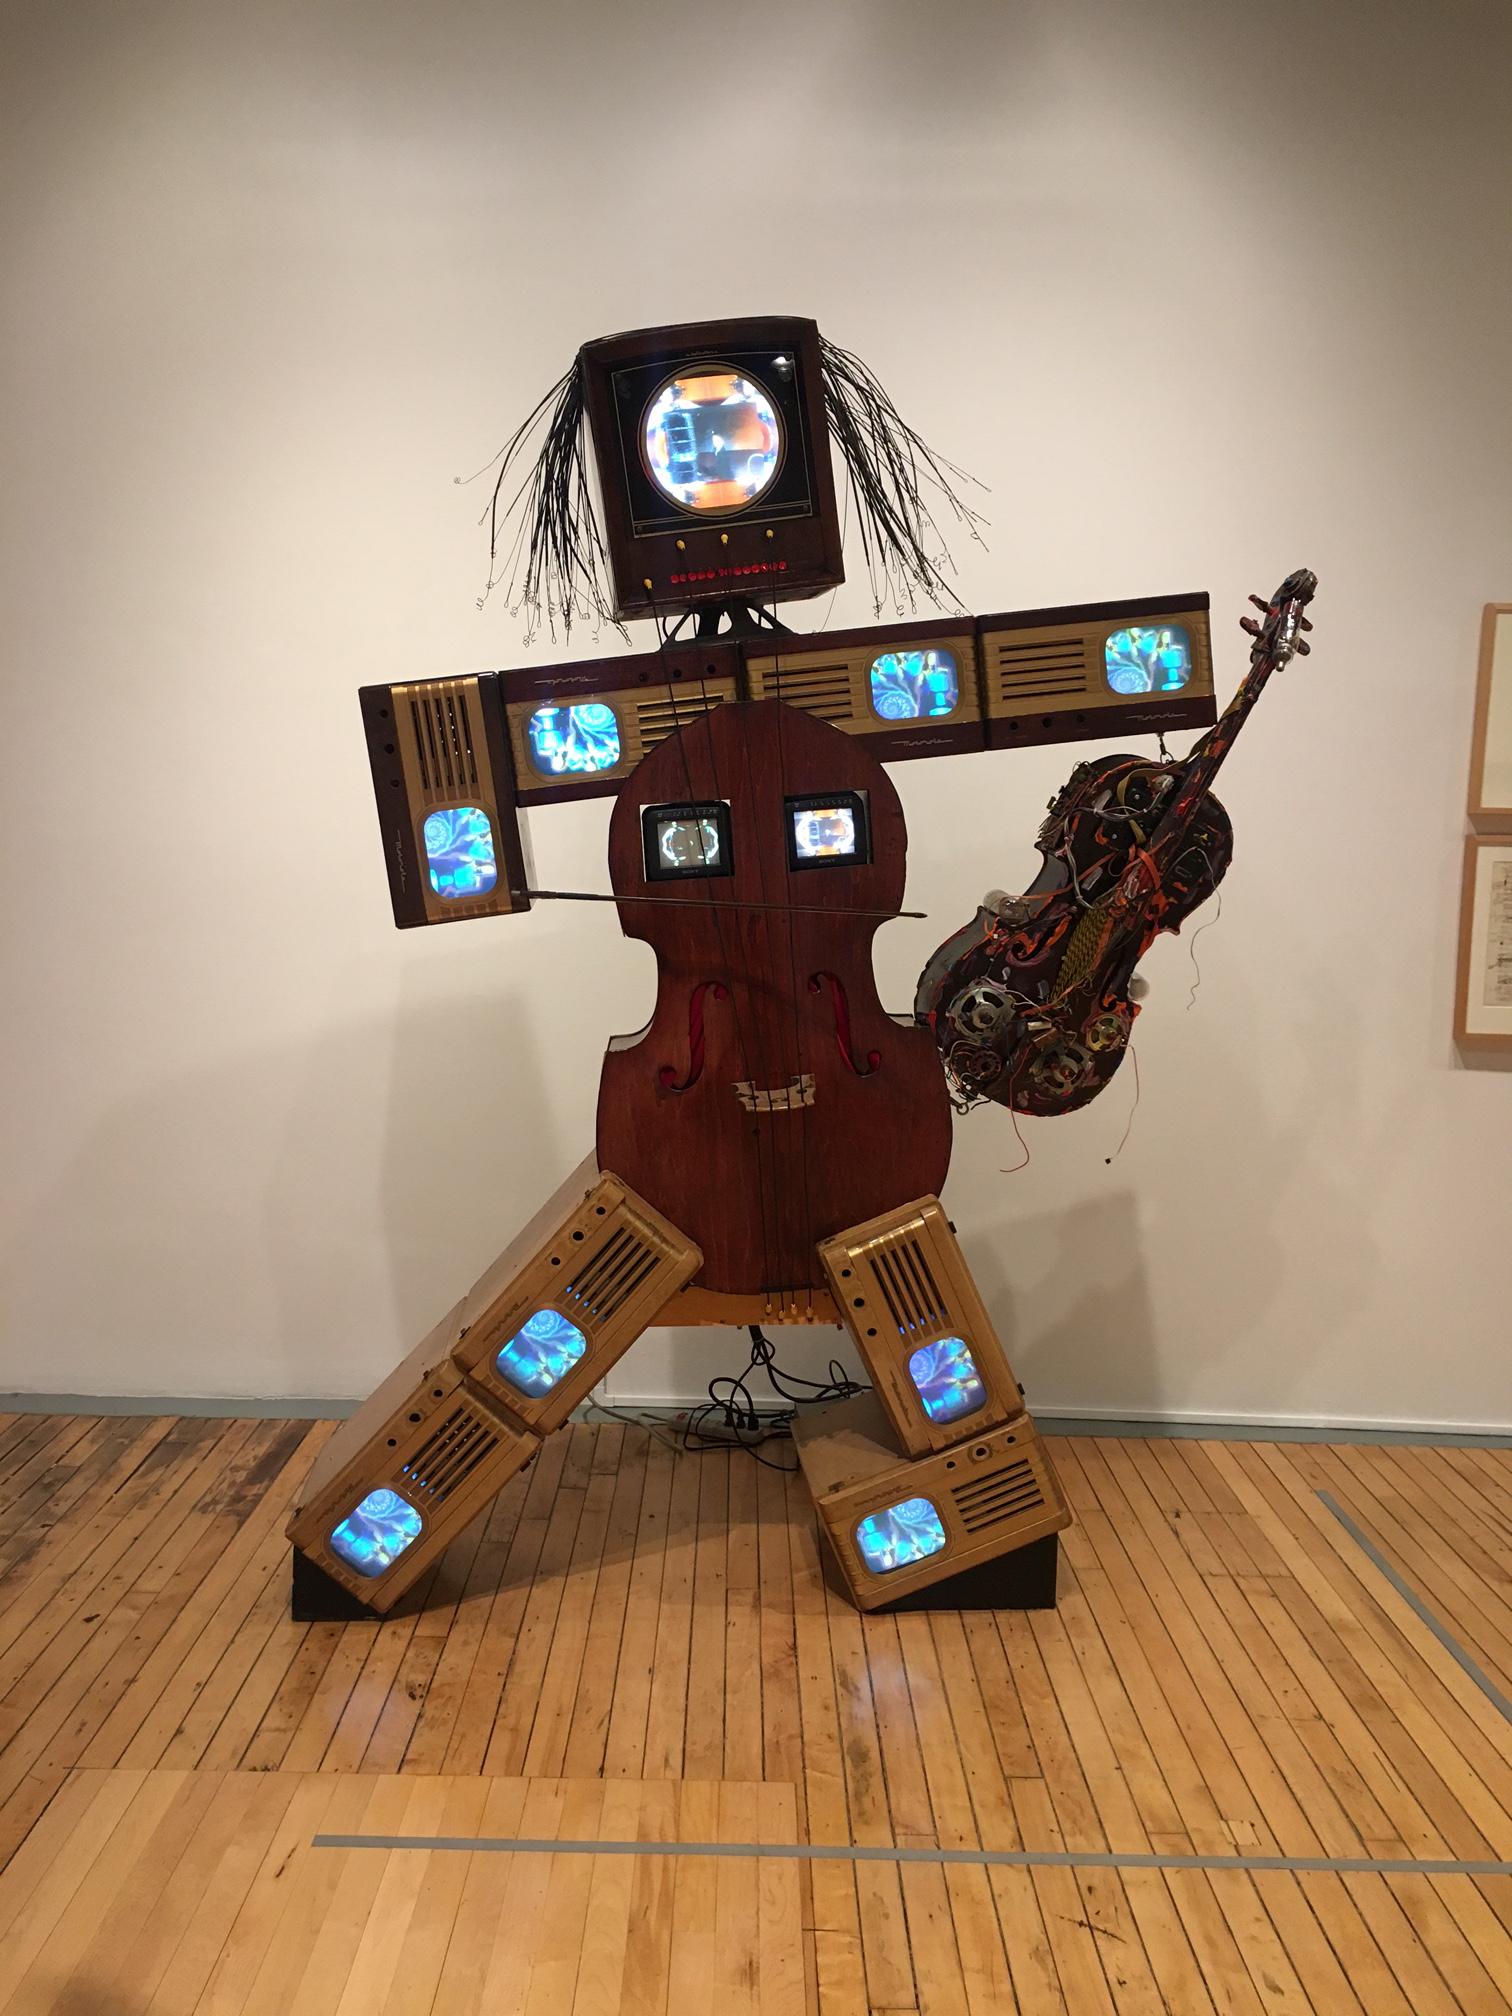 Charlotte Moorman II, 1995. Nam June Paik (American, born Korea, 1932-2006) Mixed media, cellos, viola, and television sets. Collection Rose Art Museum, Brandeis University.